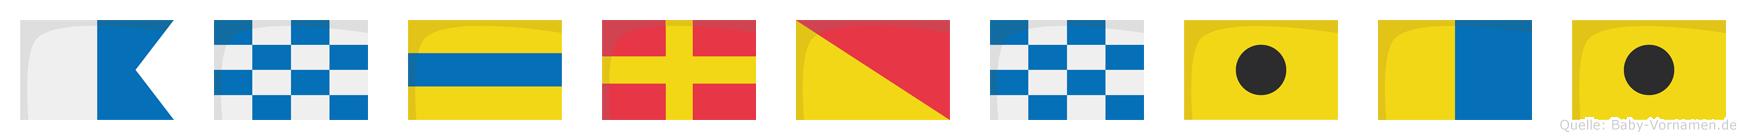 Androniki im Flaggenalphabet